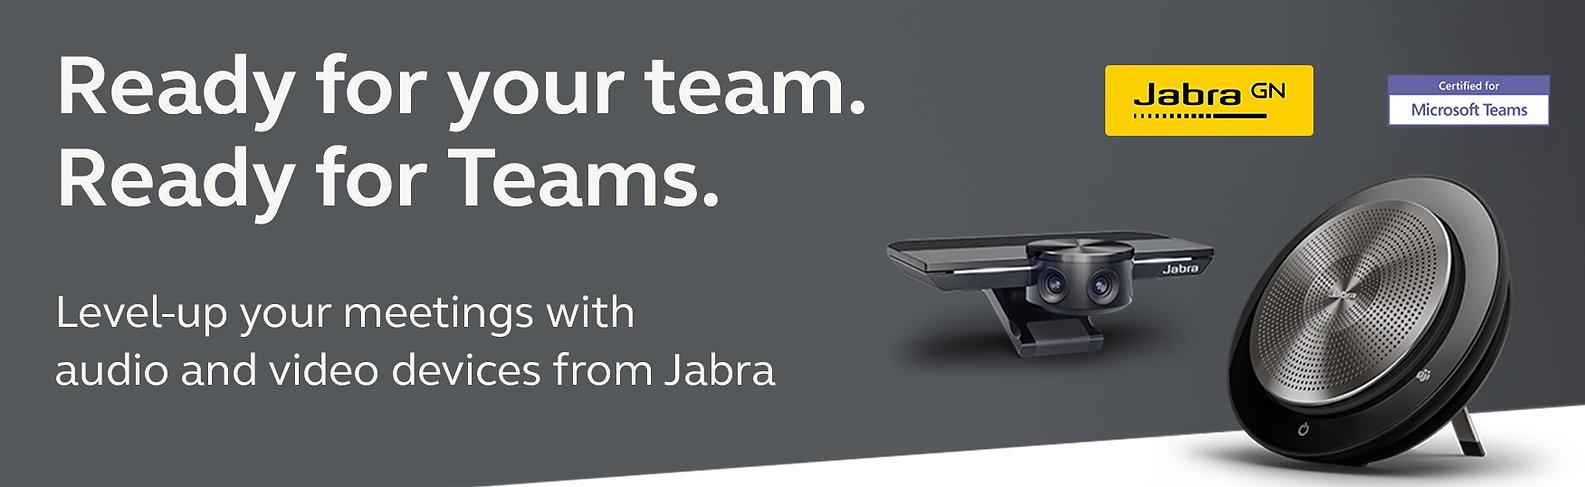 Jabra-Journey-to-Teams-News-Article-Bann